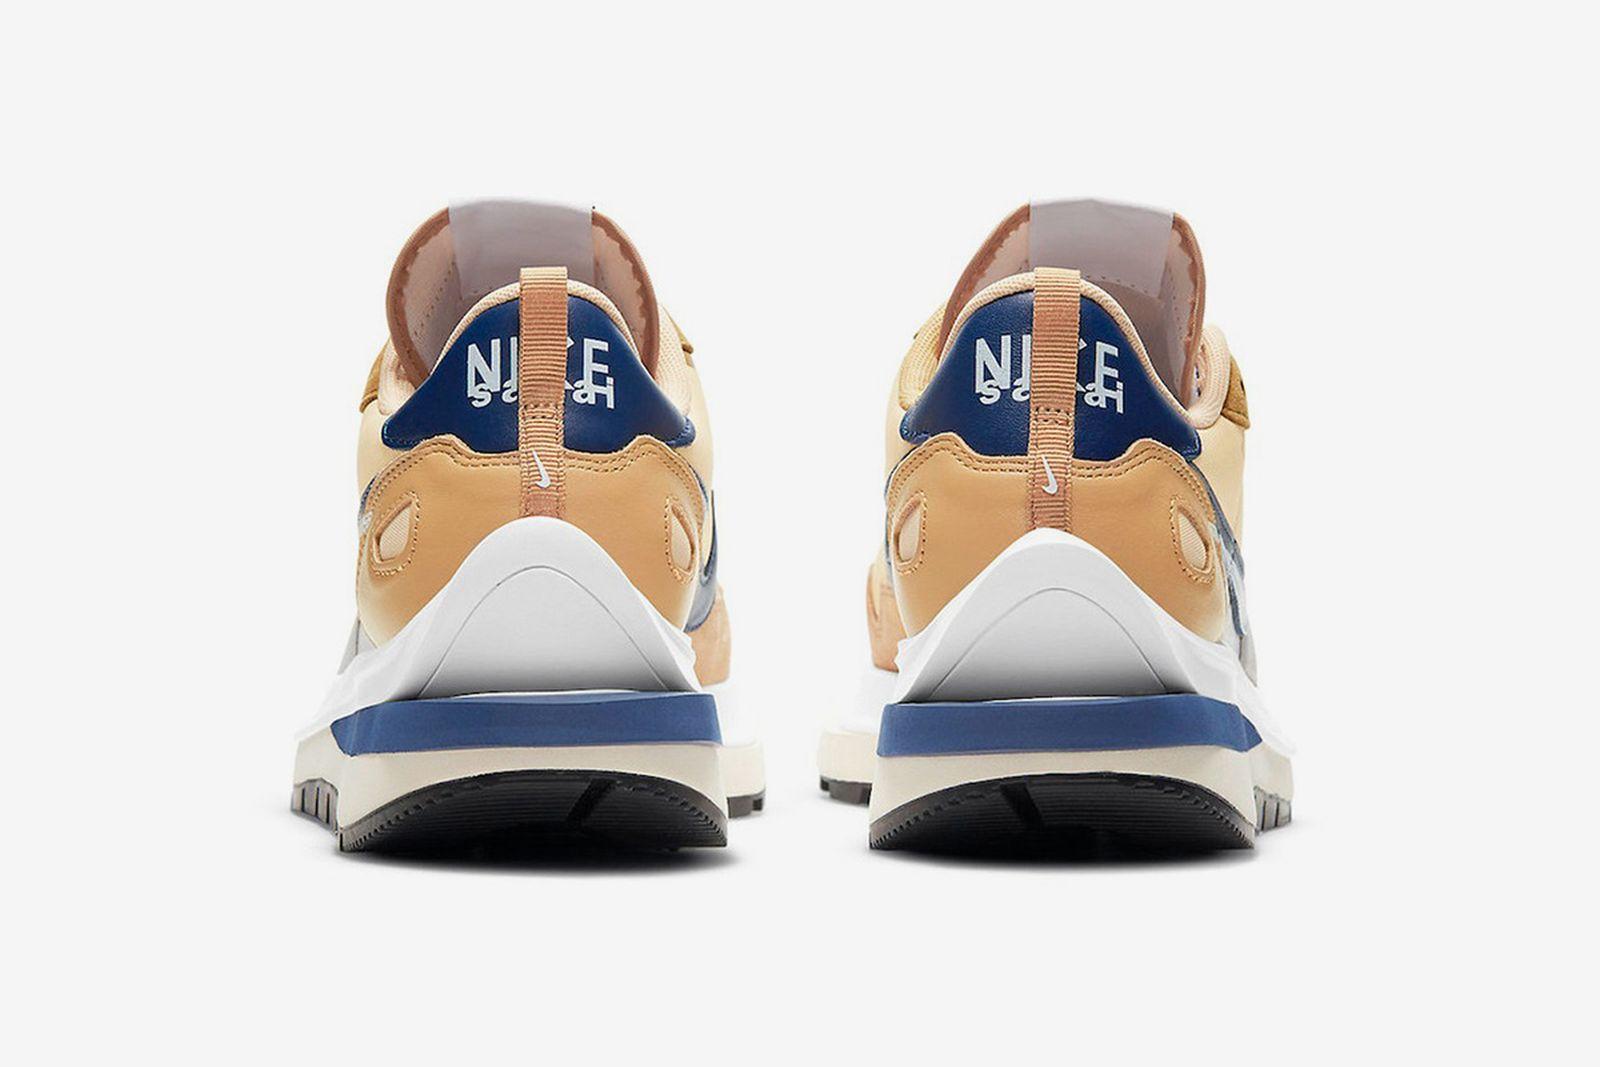 sacai-nike-vaporwaffle-release-date-price-new-03